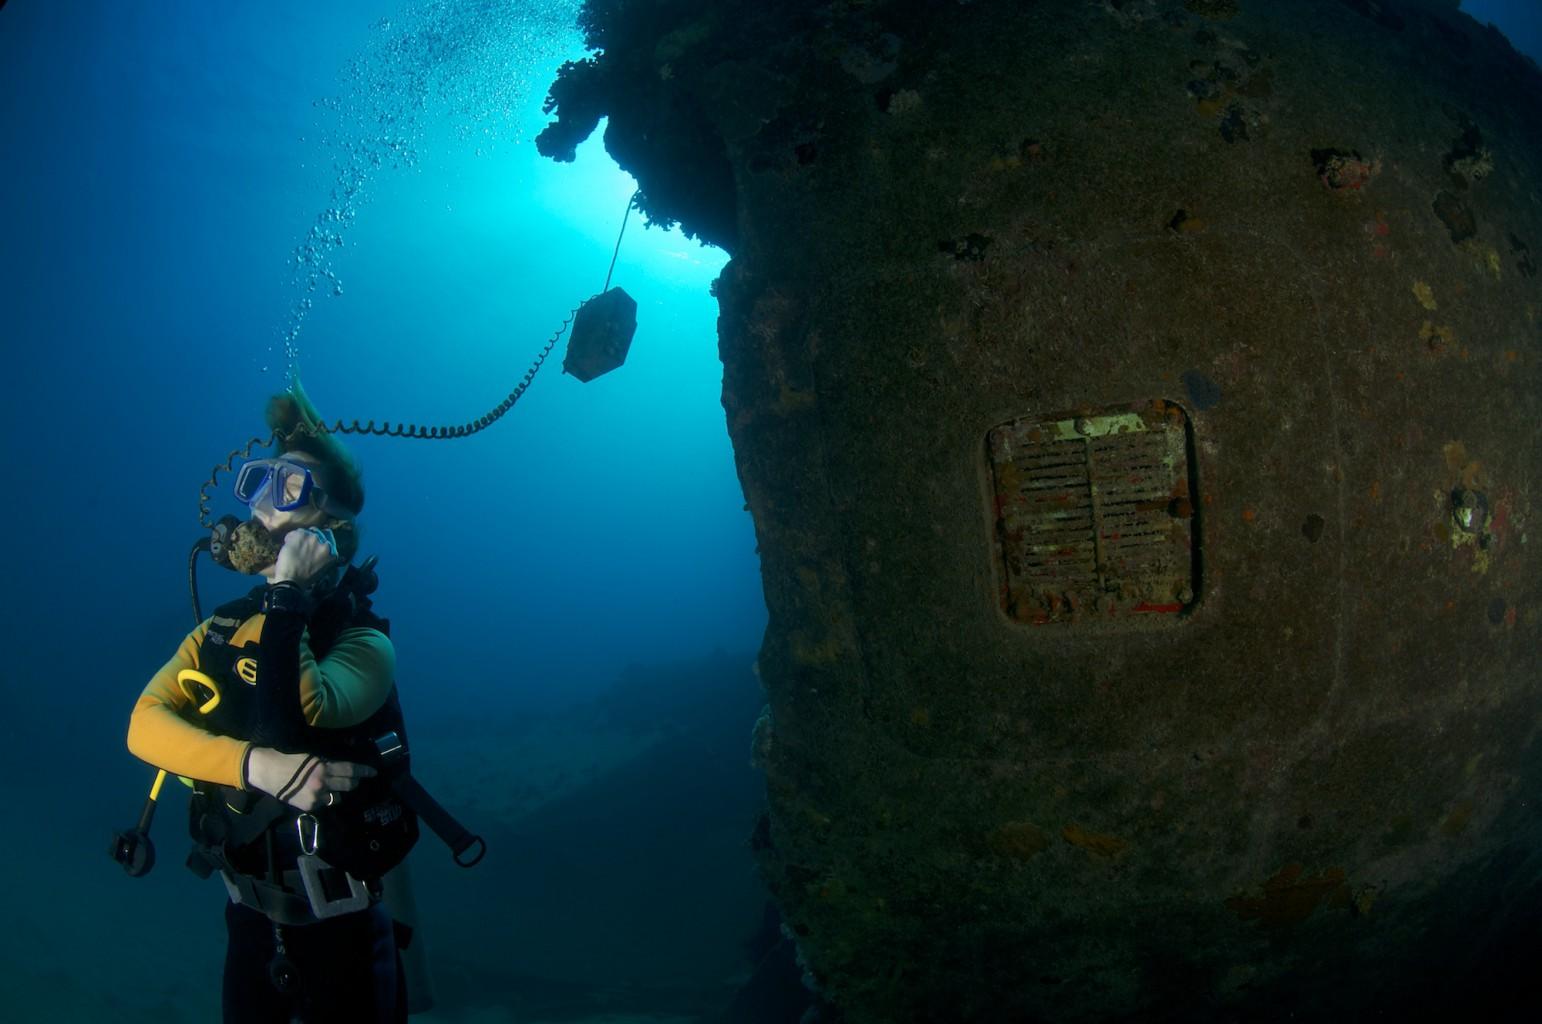 Freighter Wreck, Abu Ghusun, southern Red Sea, Egypt